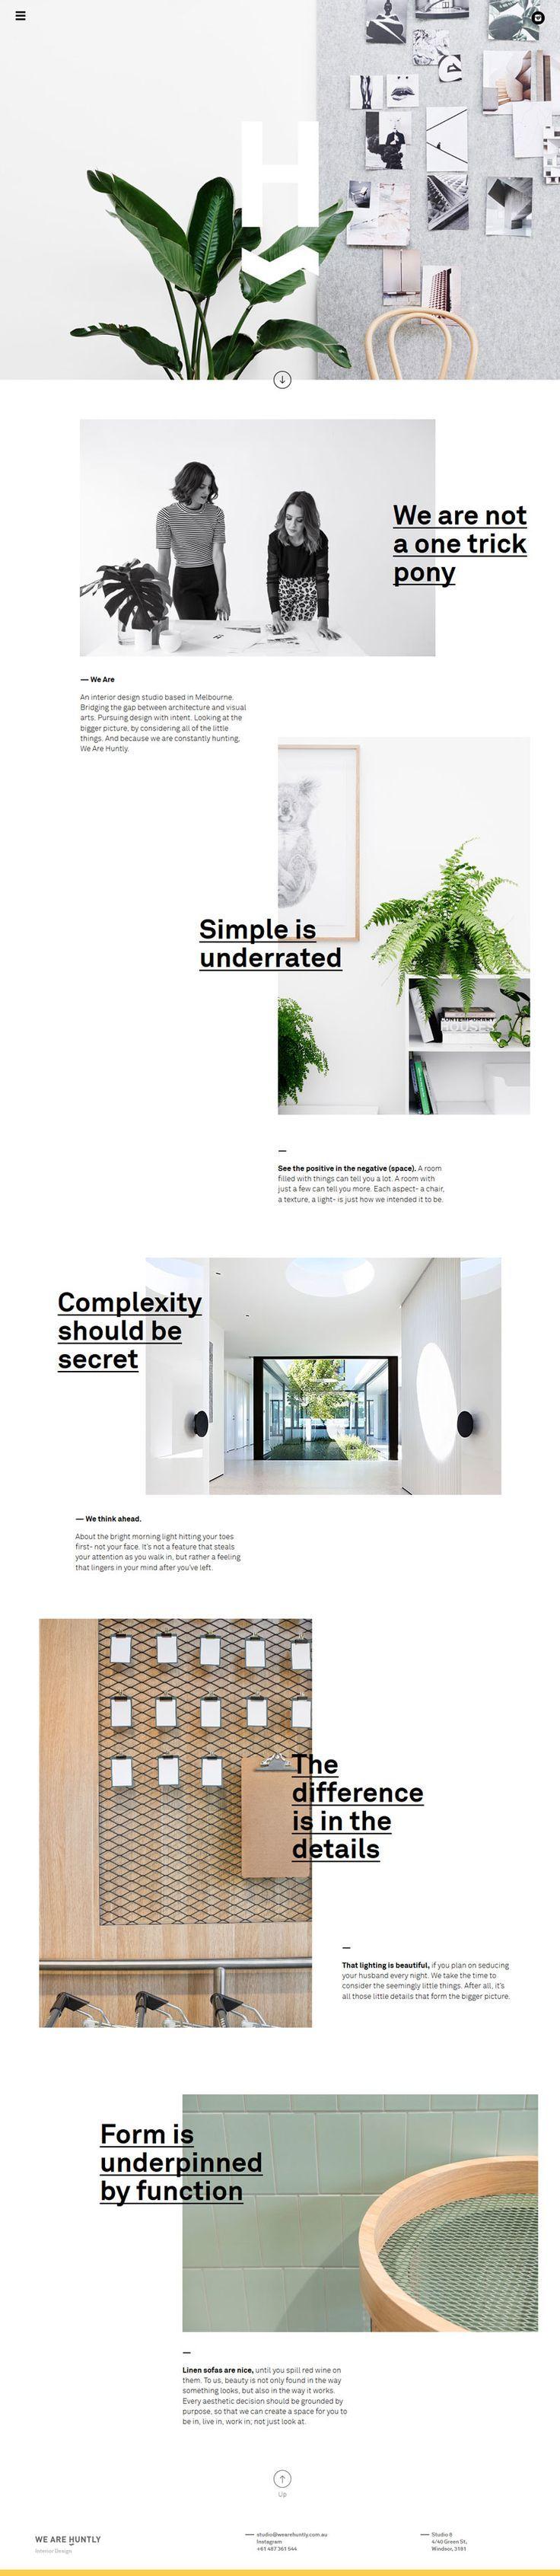 best Design images on Pinterest Graph design Chart design and